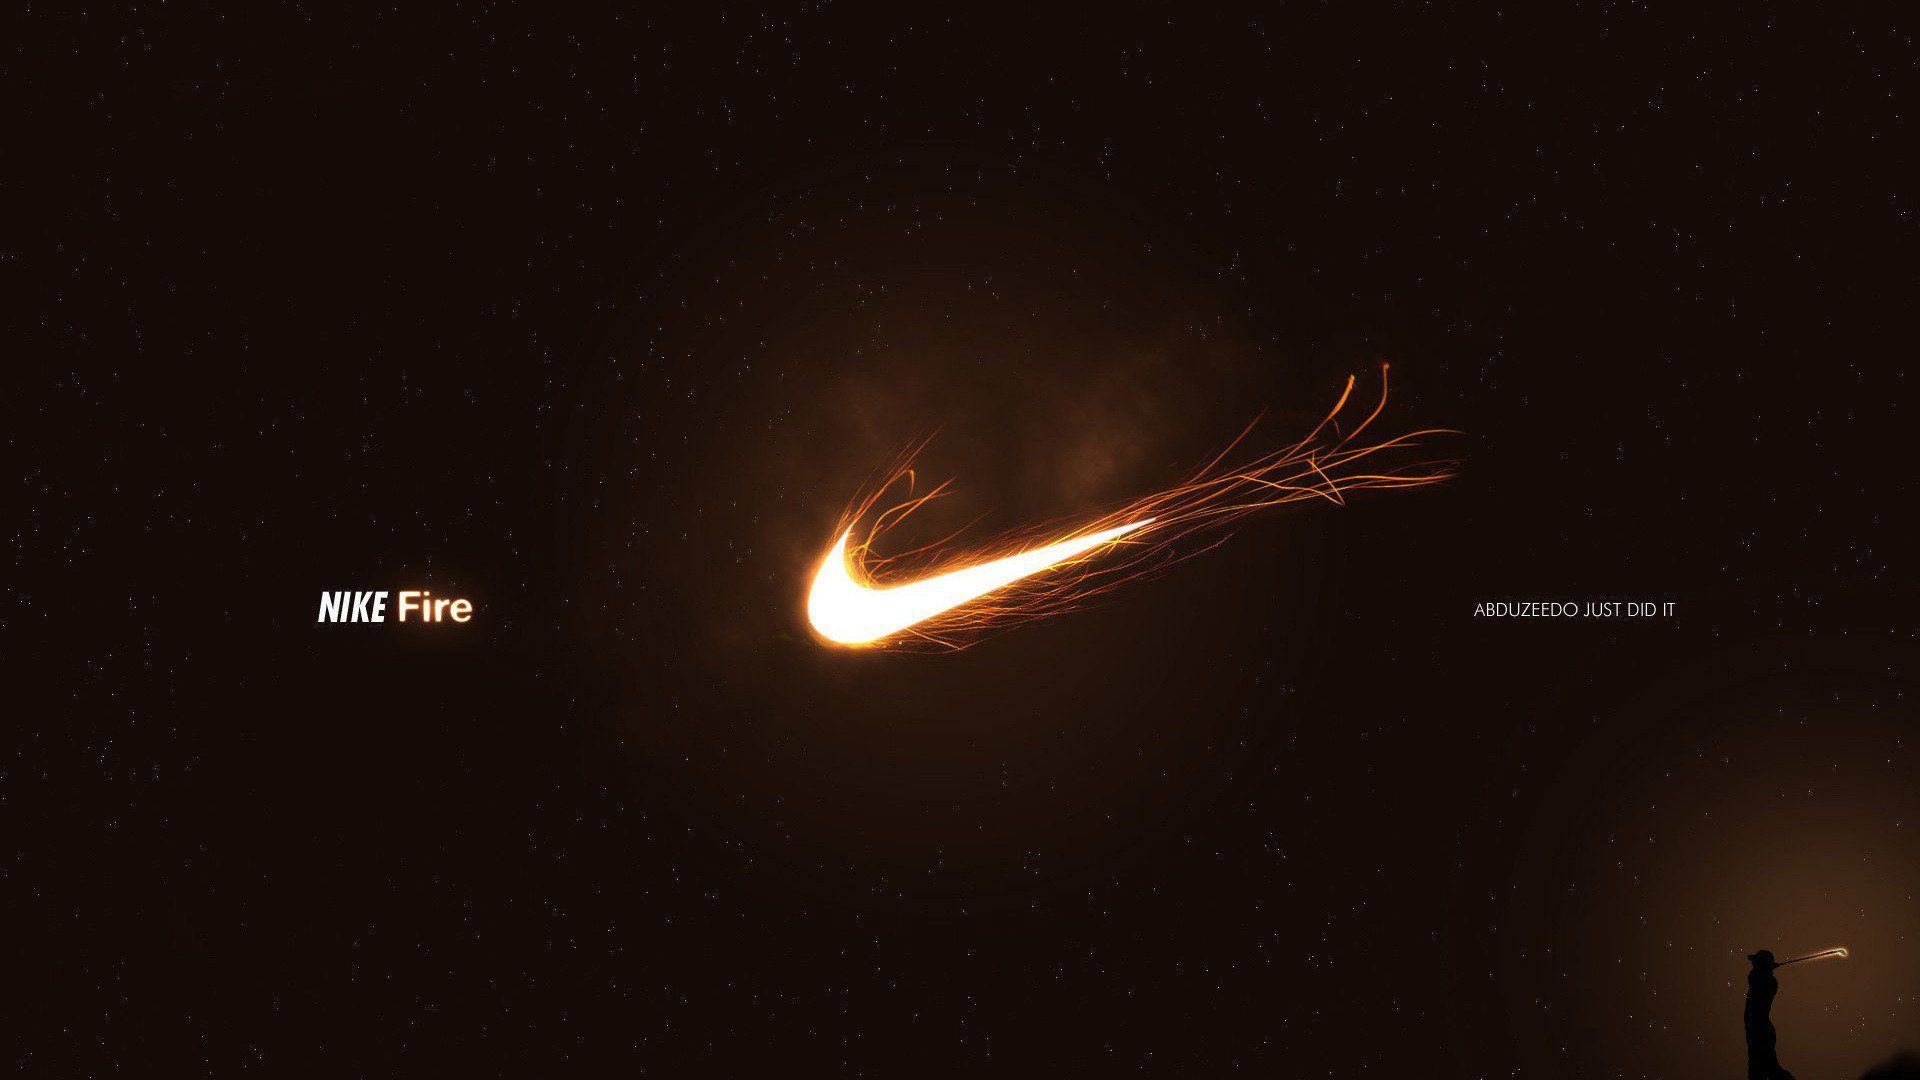 Nike Fire Logo Hd Wallpaper For Laptop